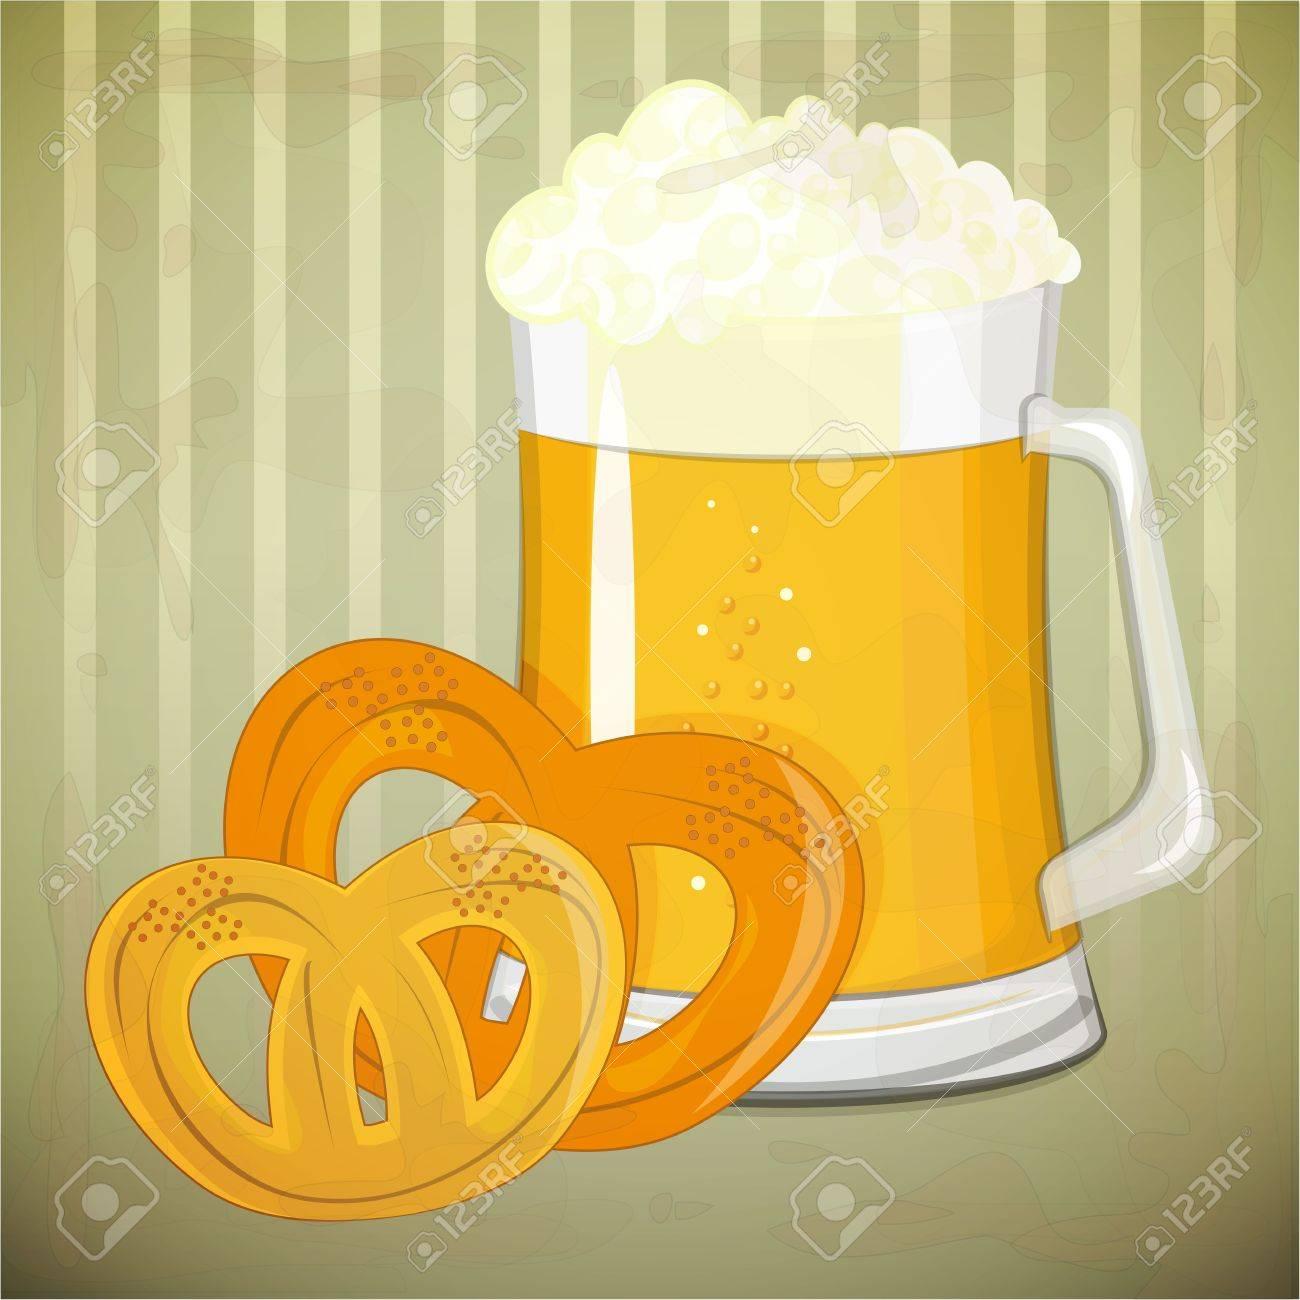 Retro Design Beer Menu - beer and  pretzels in vintage style - Vector illustration Stock Vector - 14442100